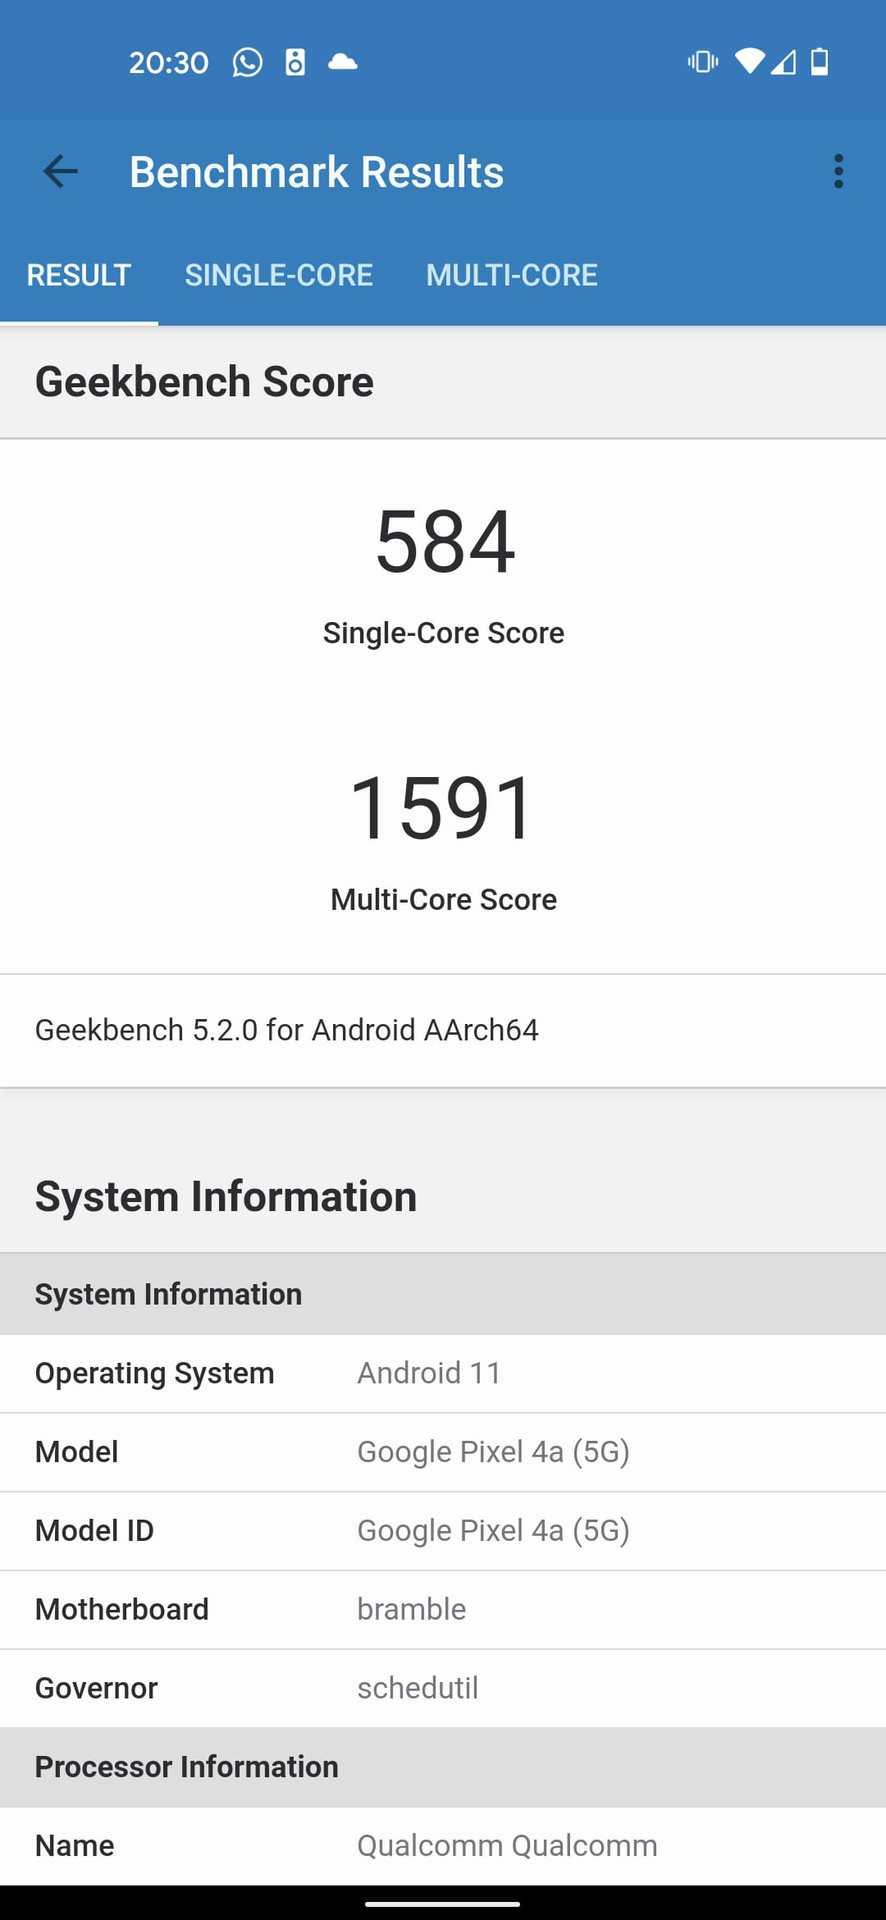 google pixel 4a 5g benchmark geekbench 5